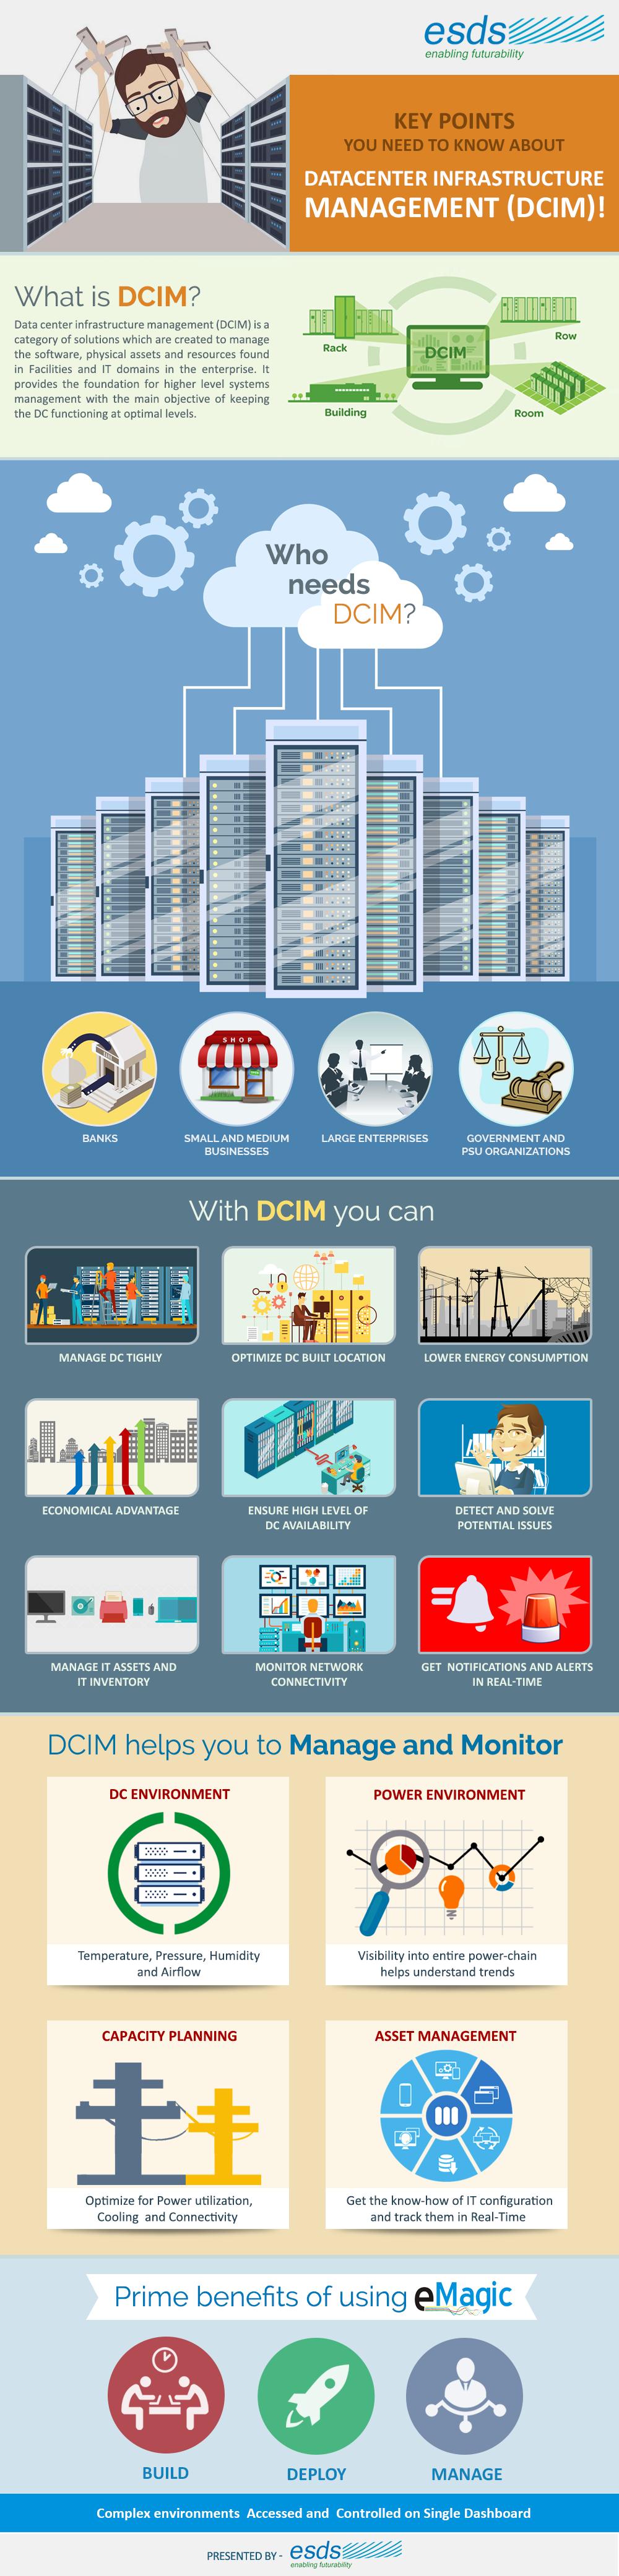 datcenter infrastructure management